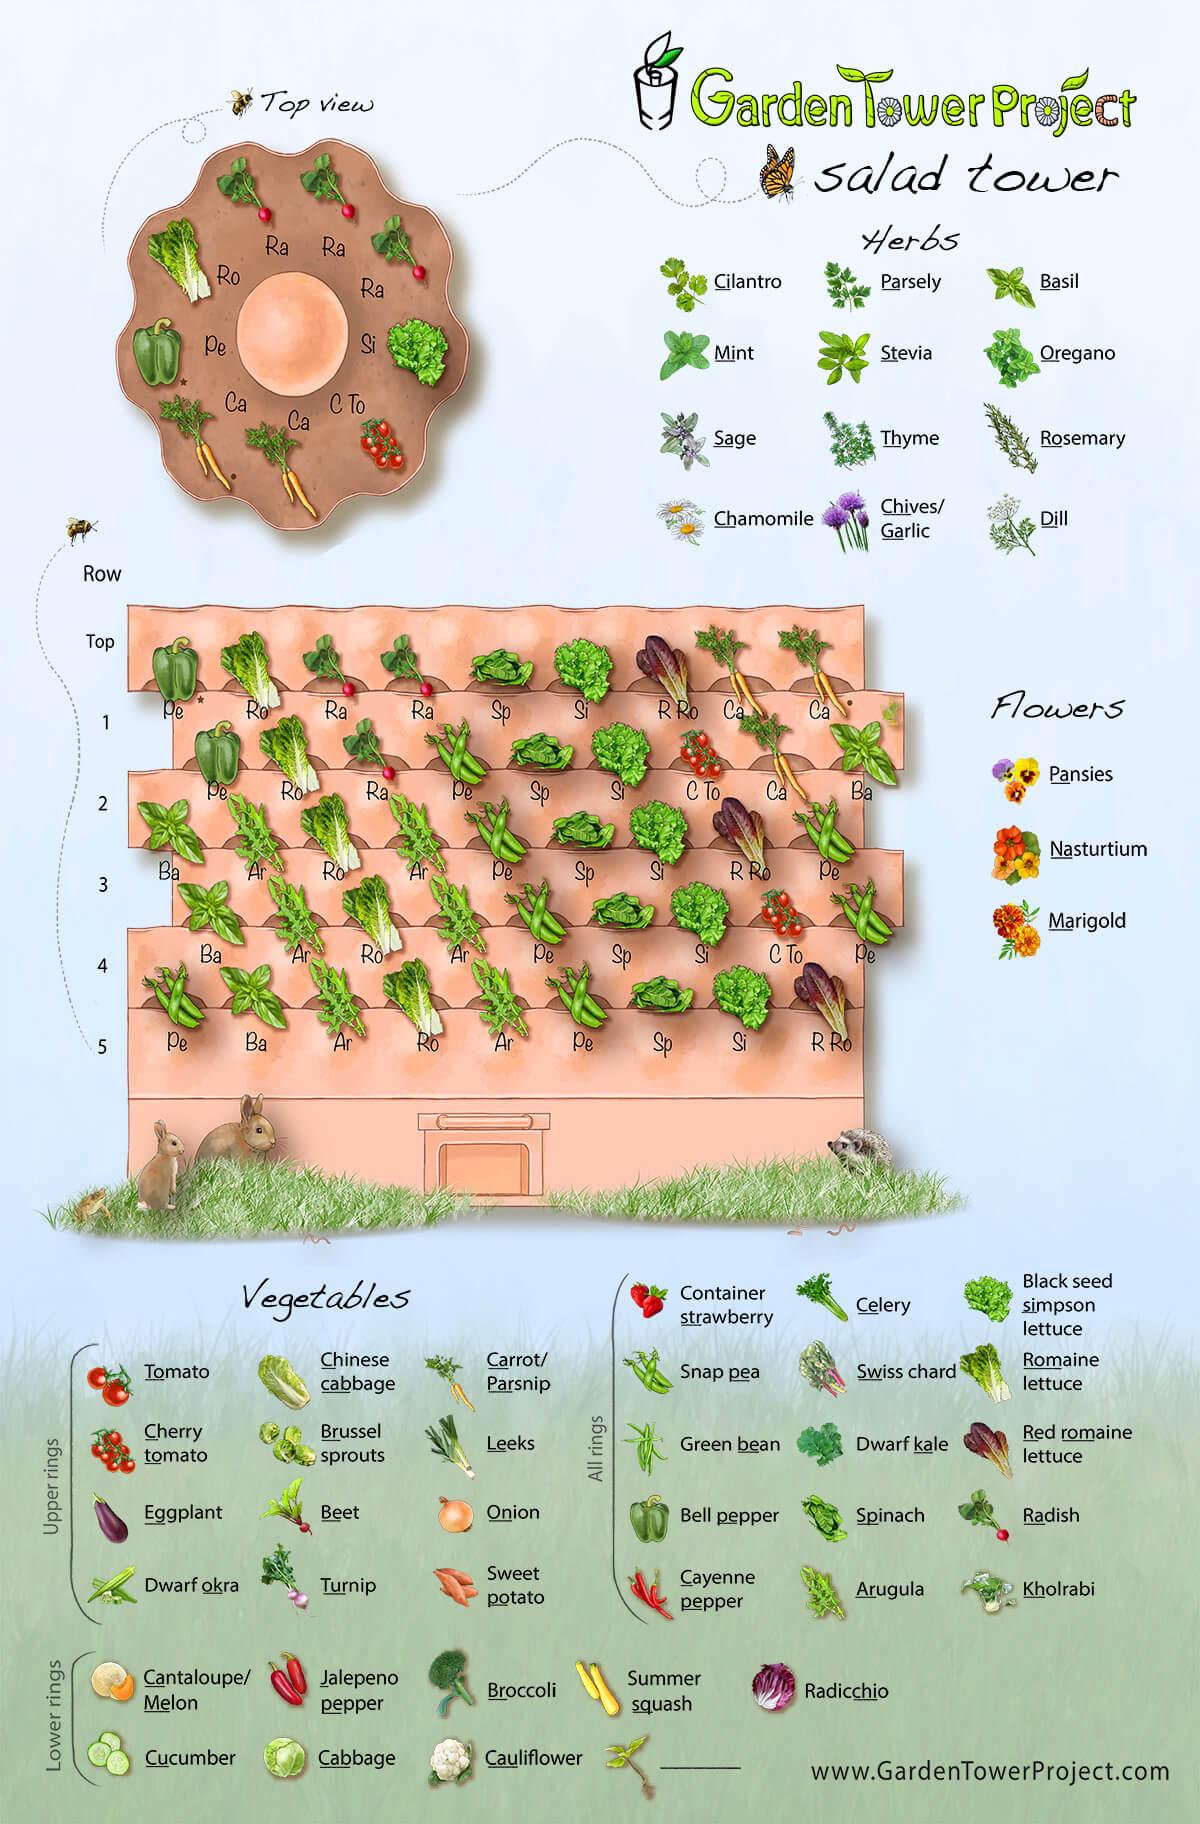 Interactive Drag Drop Planting Designer And Salad Tower Sample